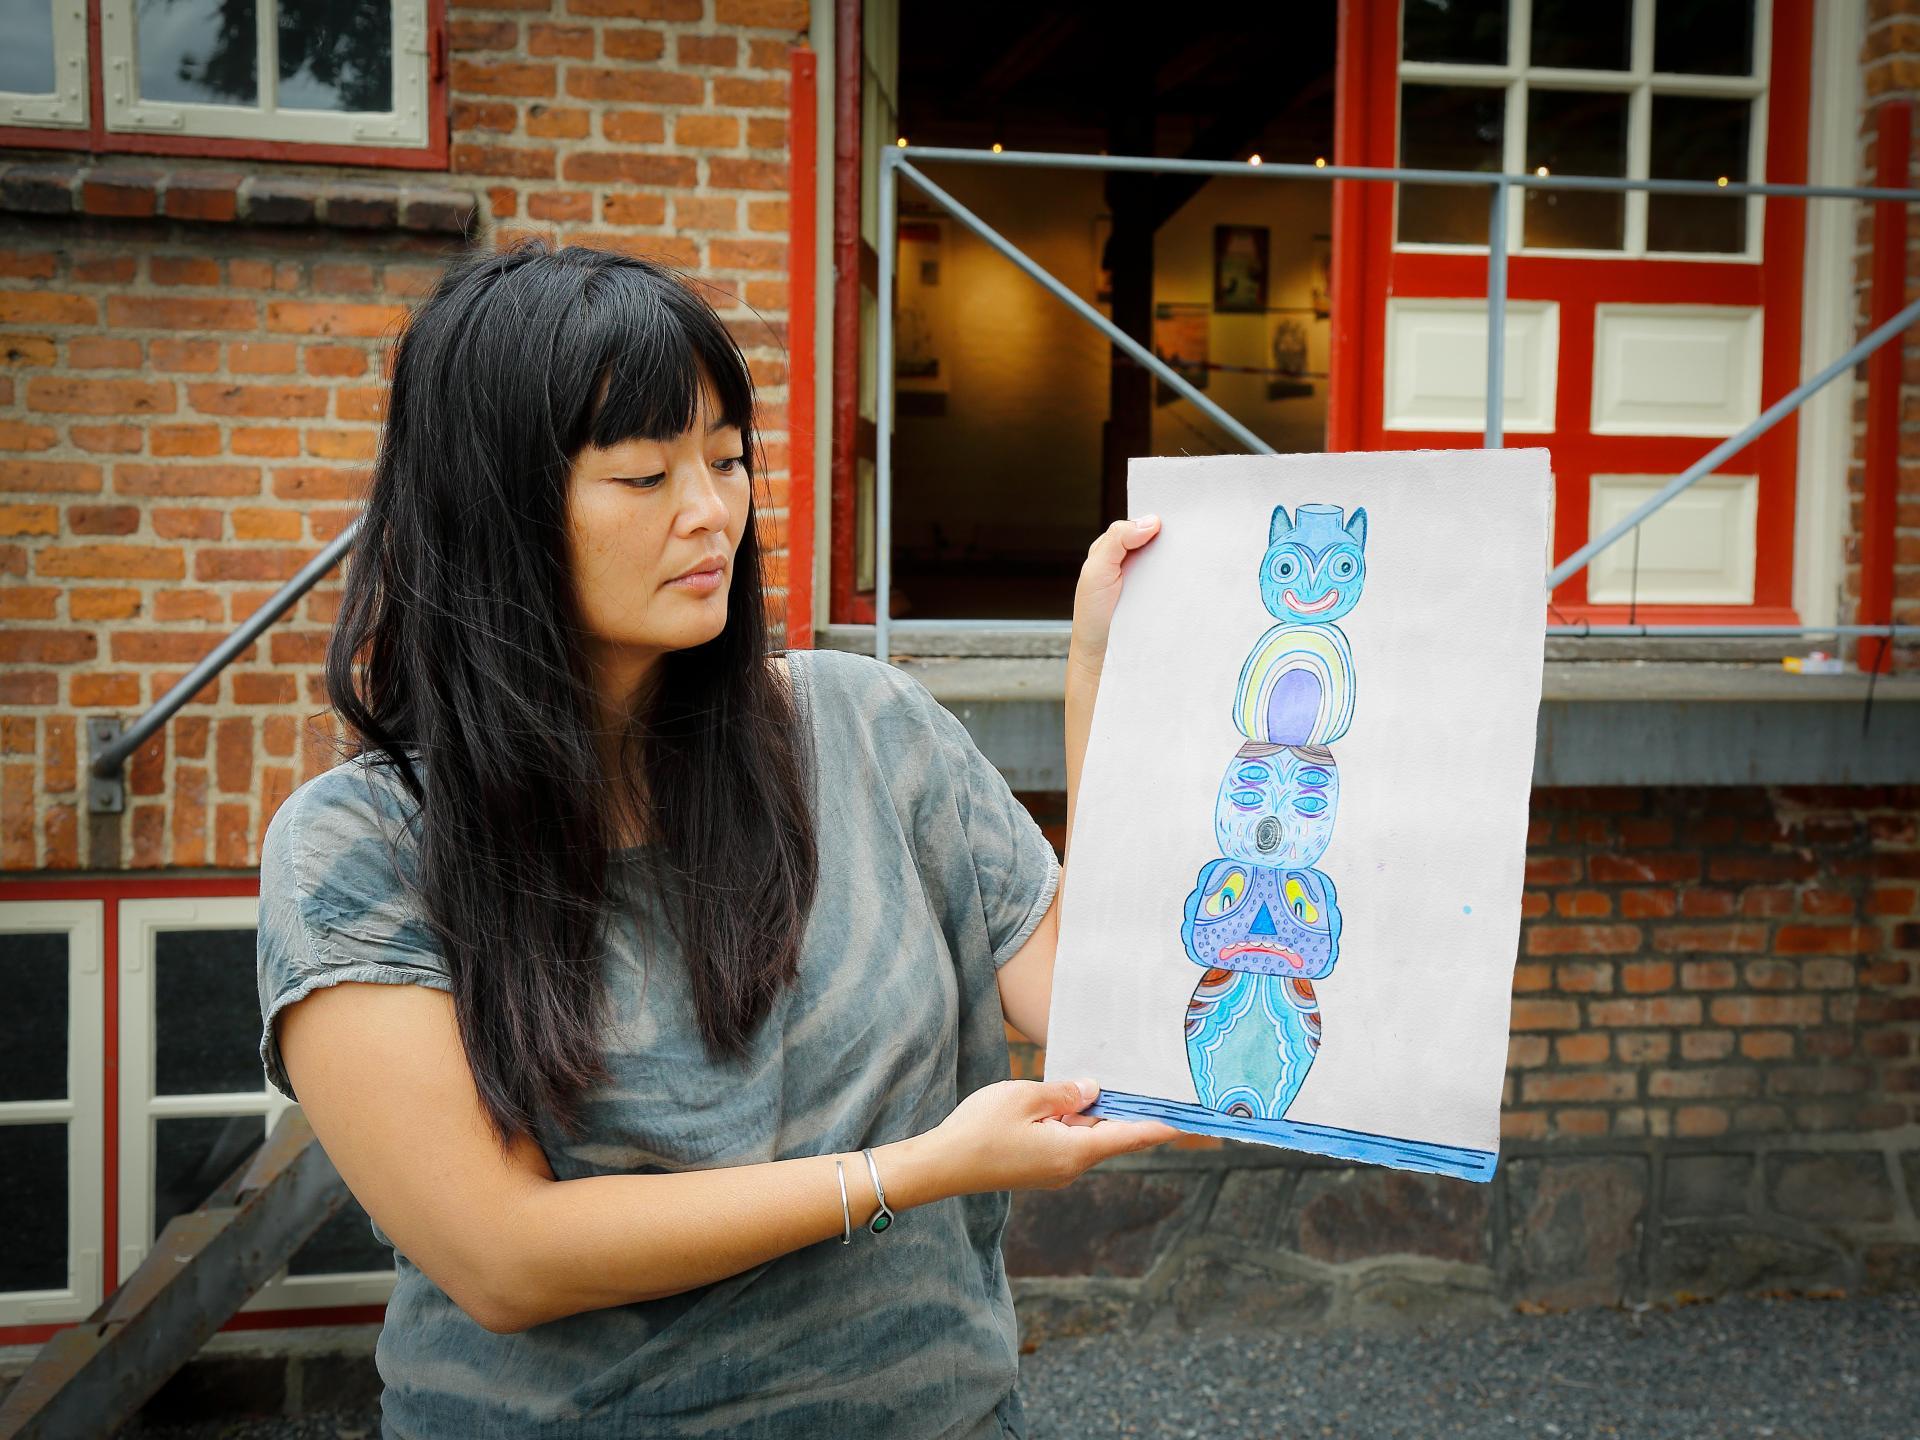 16-08-2016-Fie Norsker_Torben Papillon_Foturi Art (12)-web